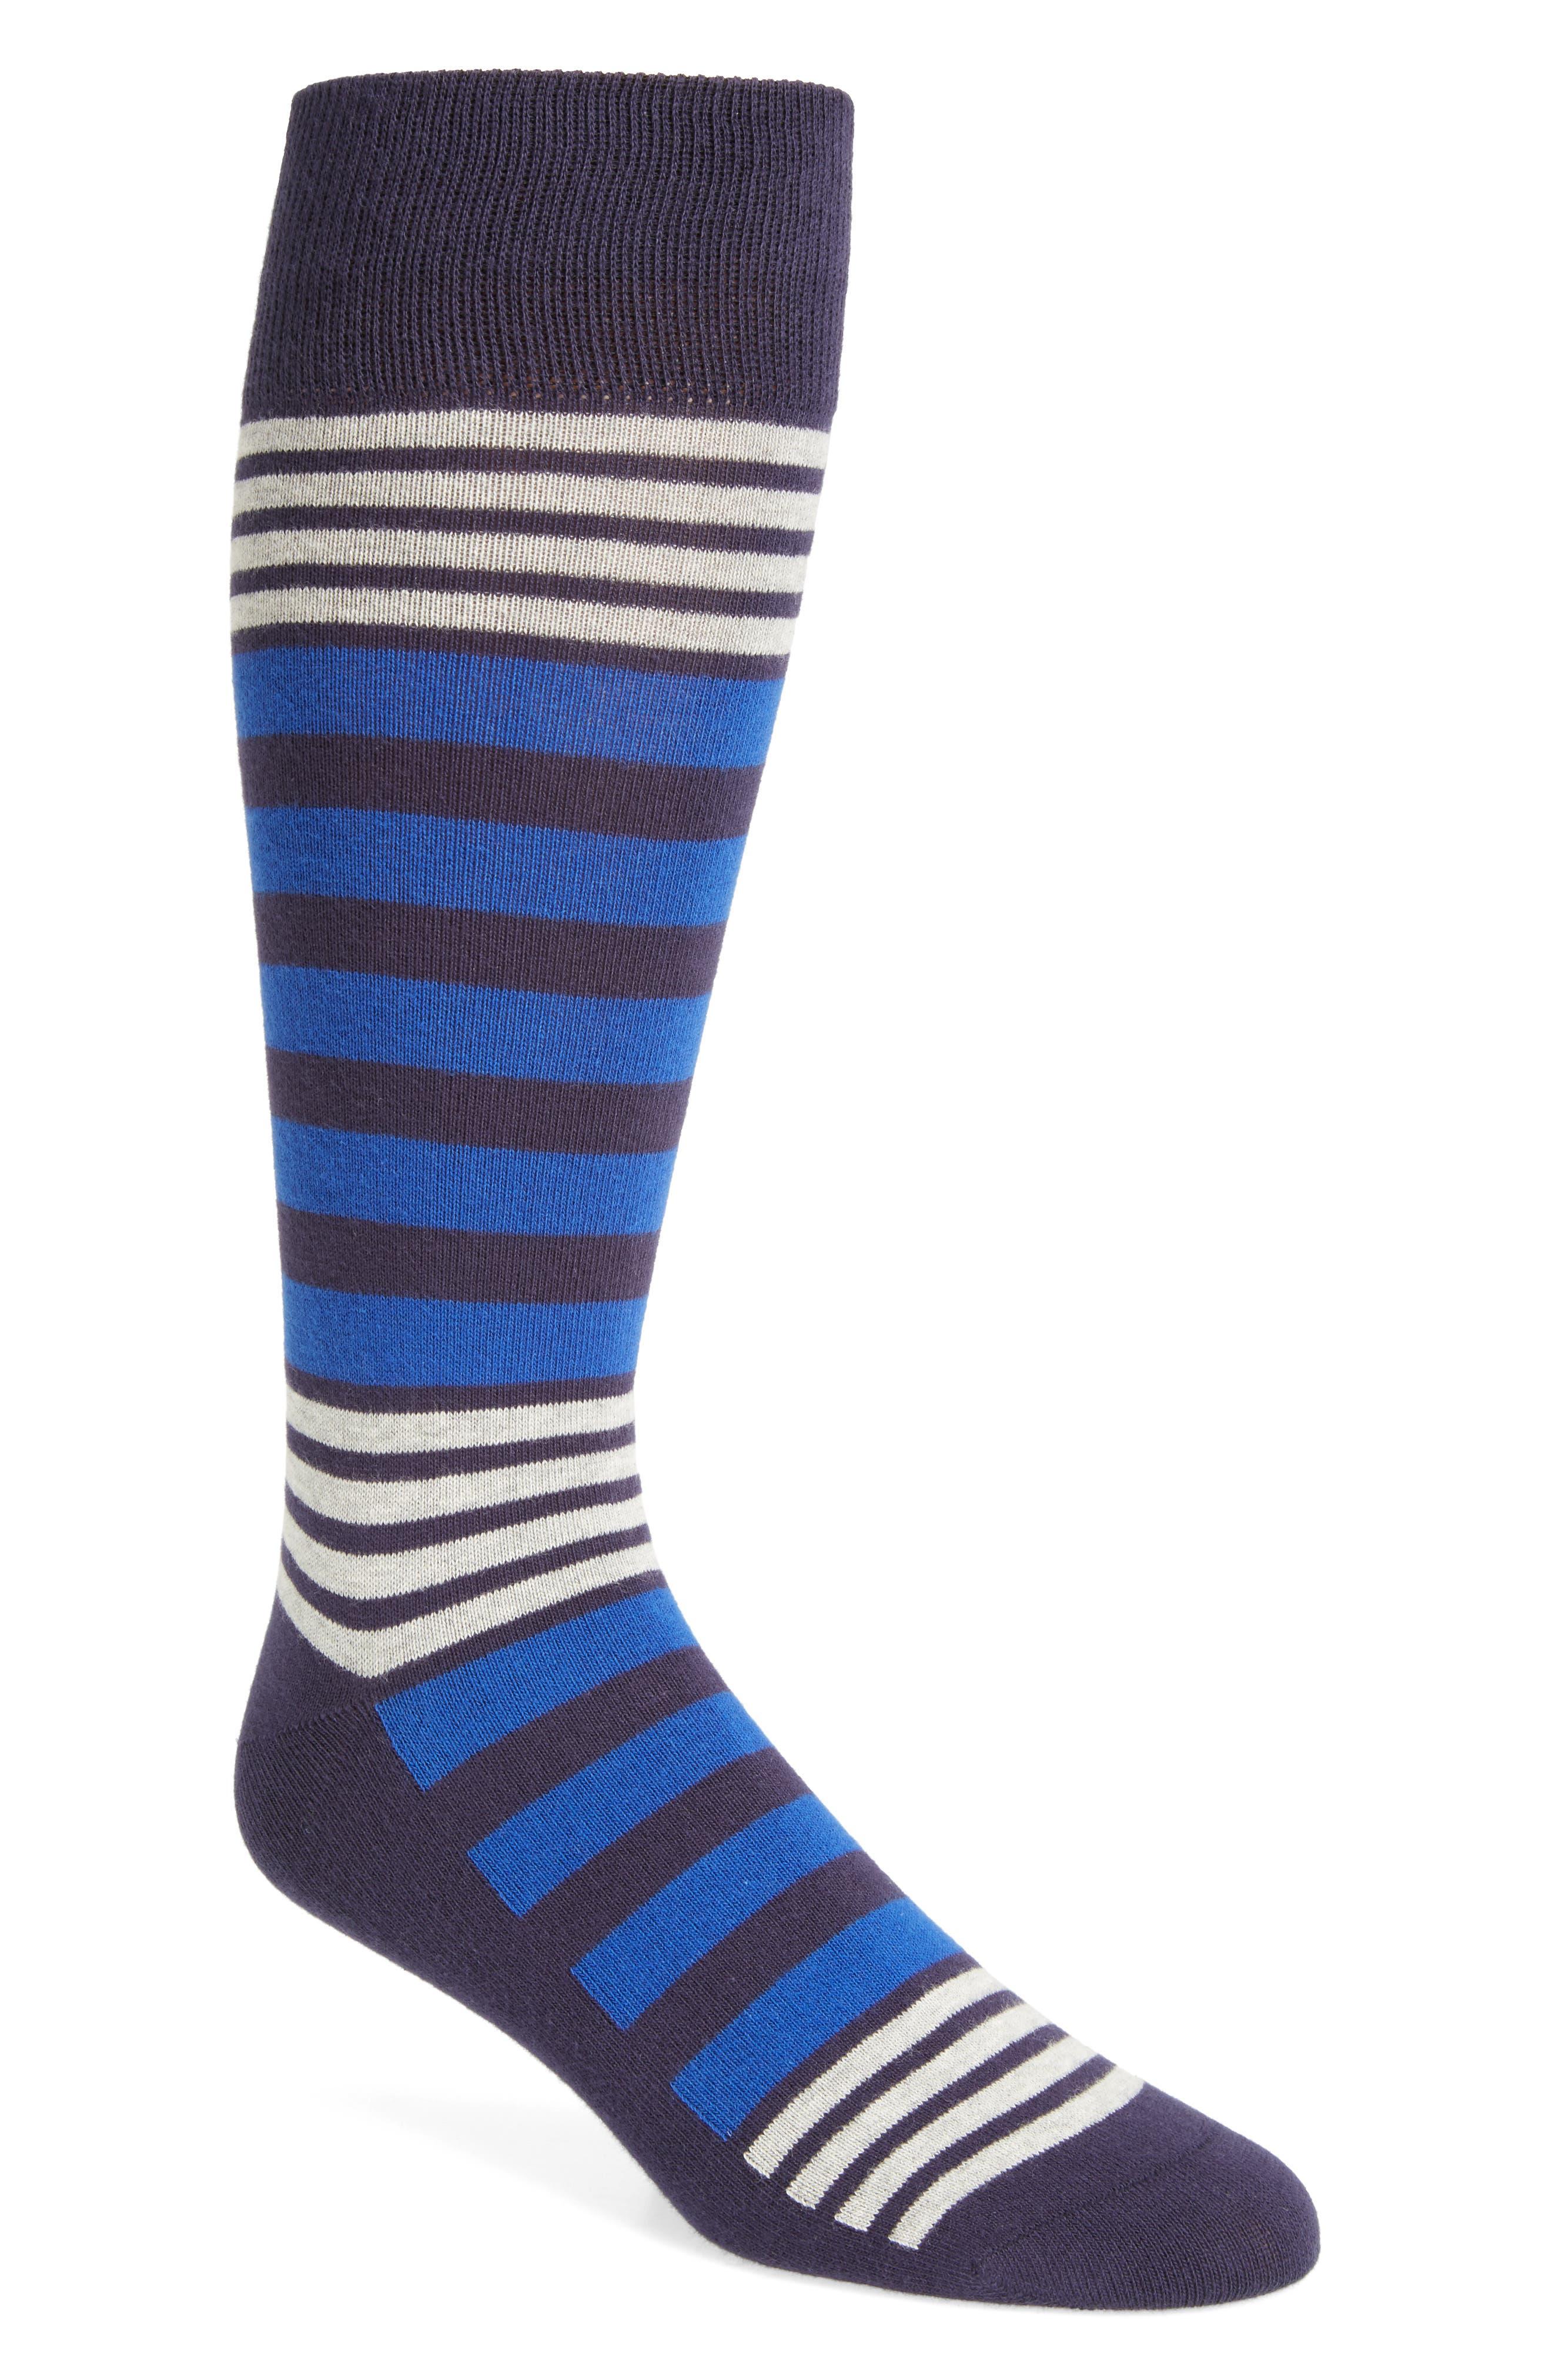 Calibrate Variegated Stripe Socks